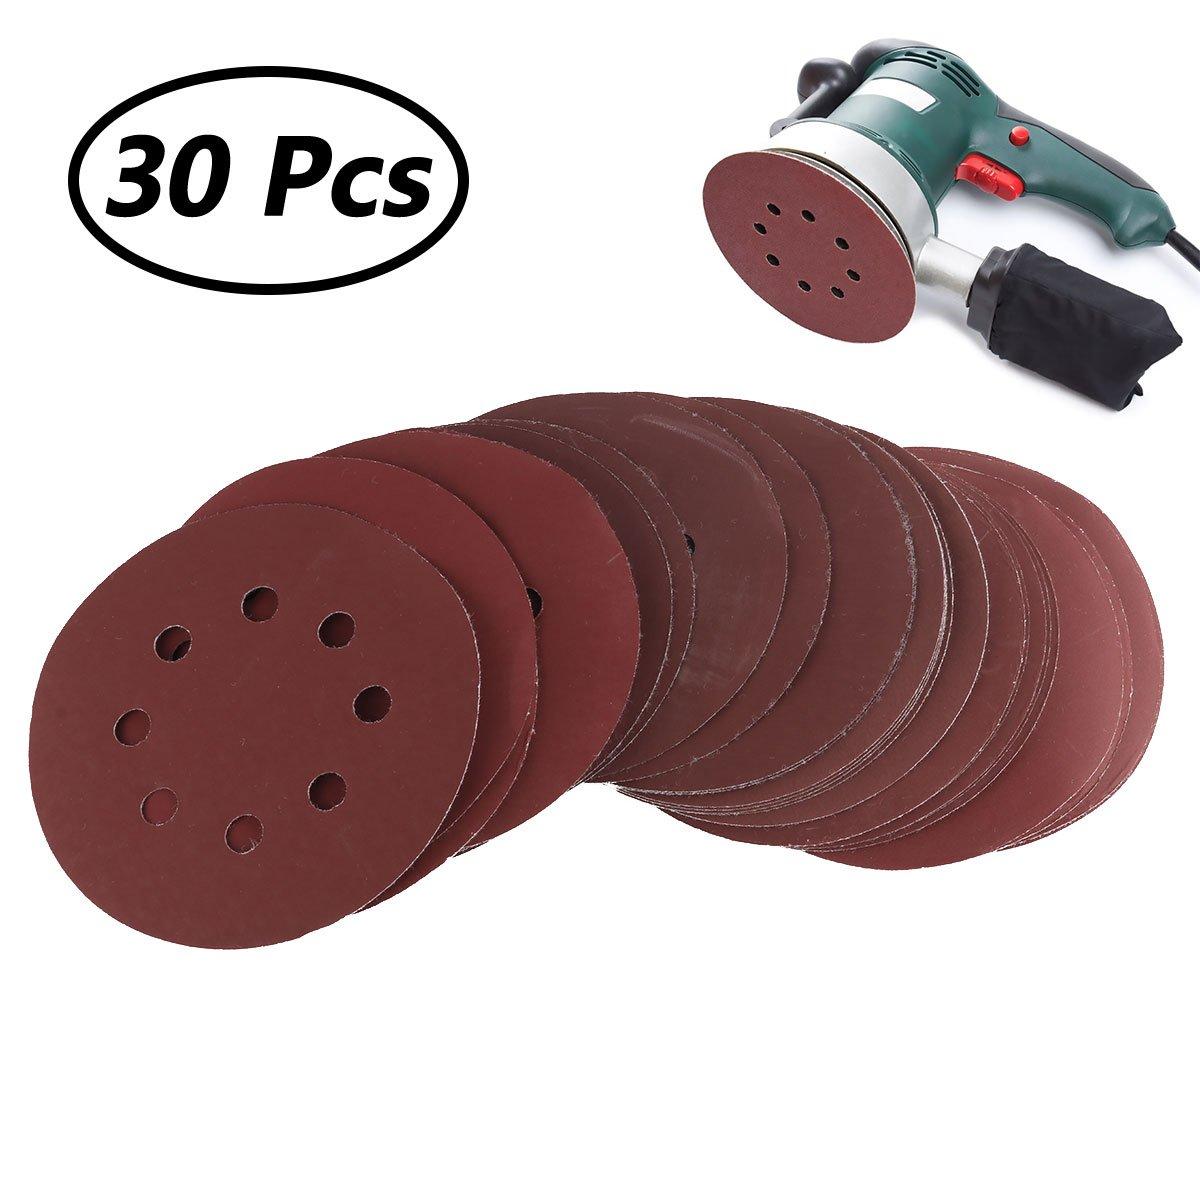 Freebily 30Pcs 125mm/5inch Sanding Discs 8 Holes Sandpaper Assorted 800/1000/1200/1500/2000 Grits Hook and Loop Aluminum Oxide Sandpaper for Random Orbital Sander